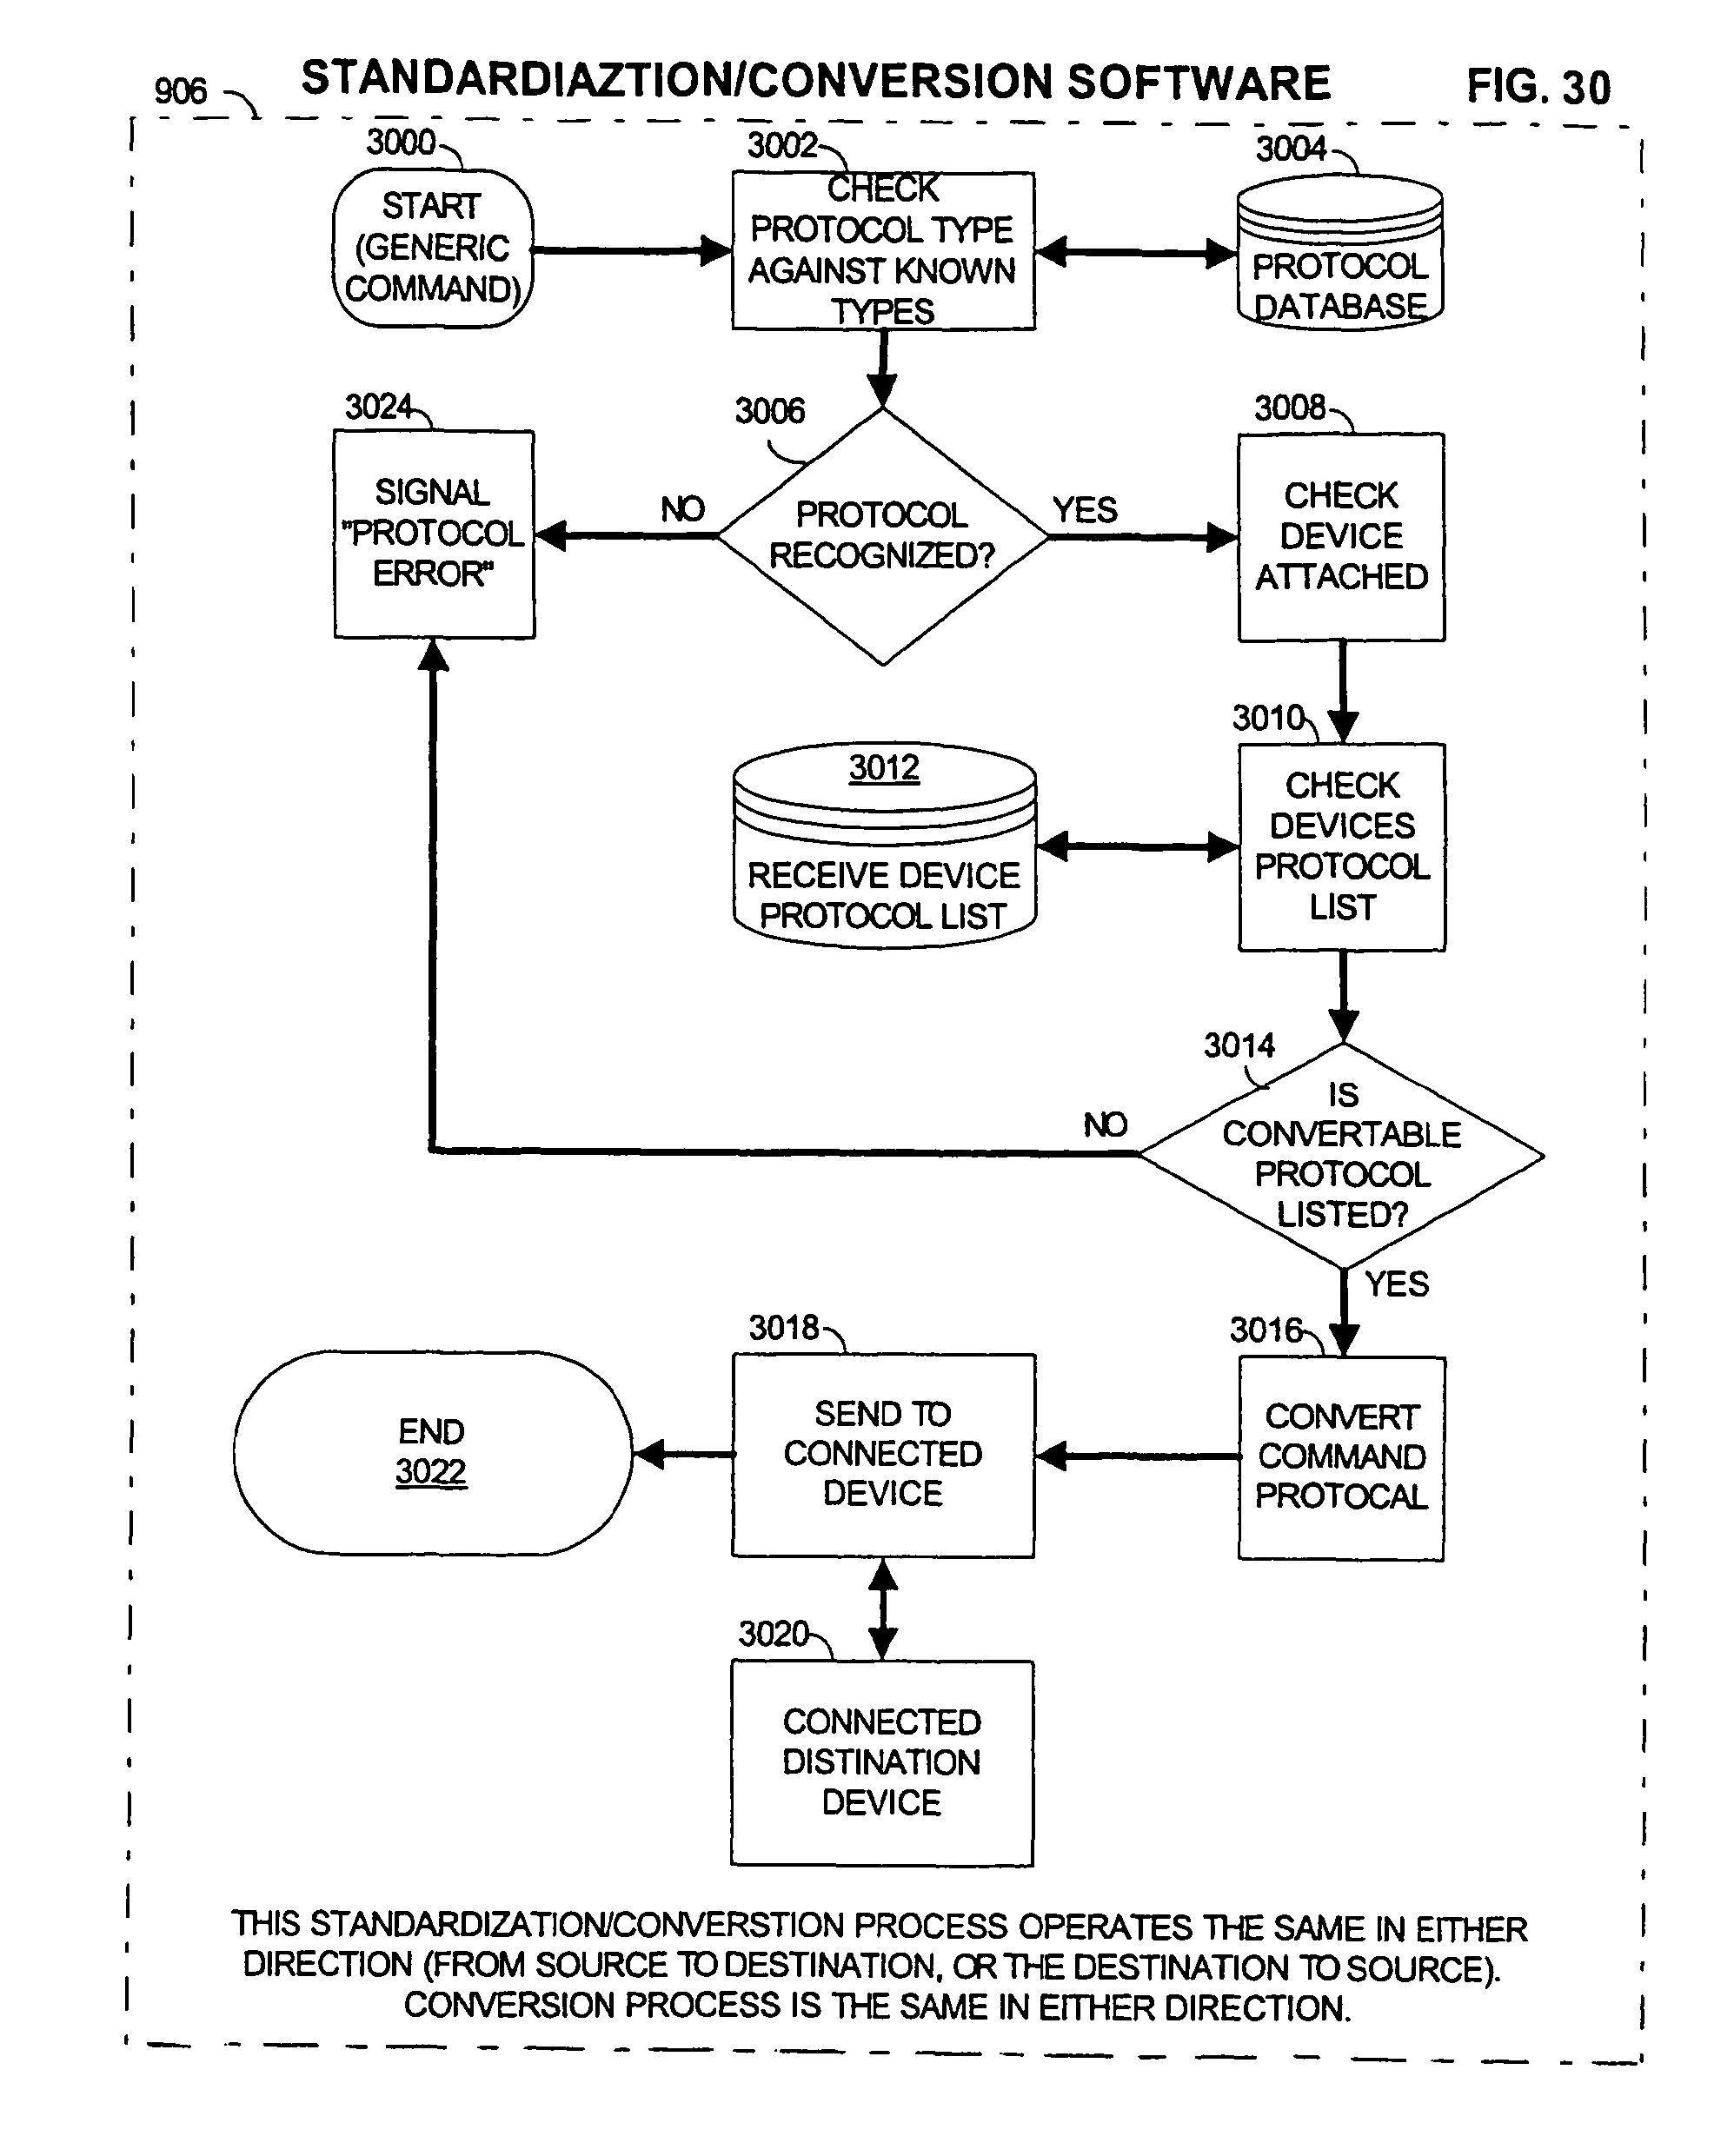 Patent US 9,510,320 B2